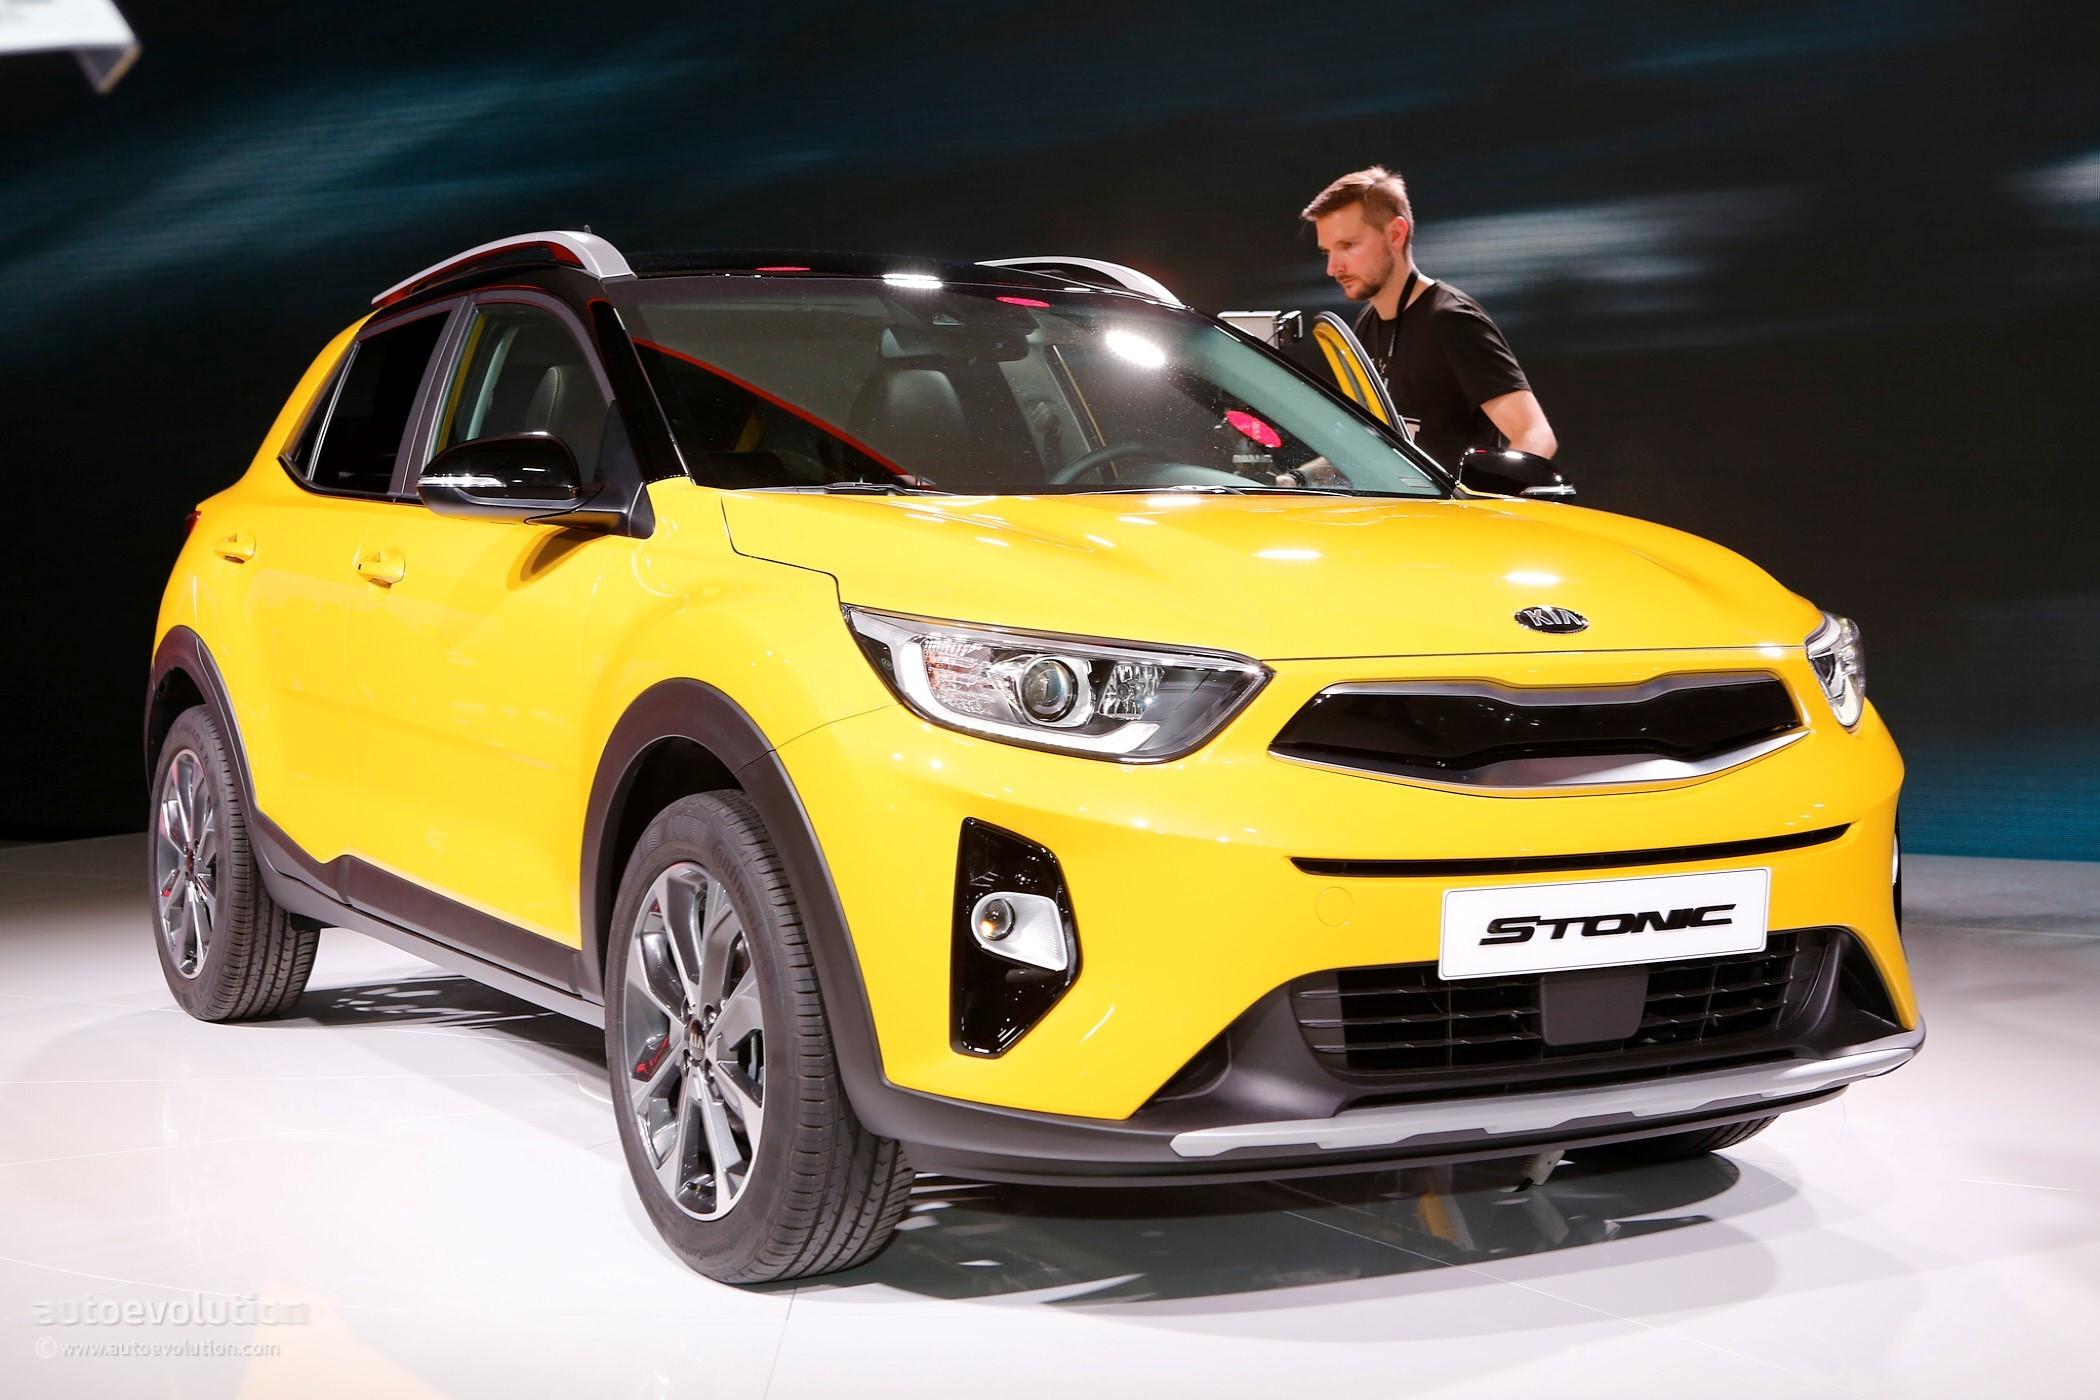 2018 Kia Stonic Looks Conservative Compared To New Hyundai ...